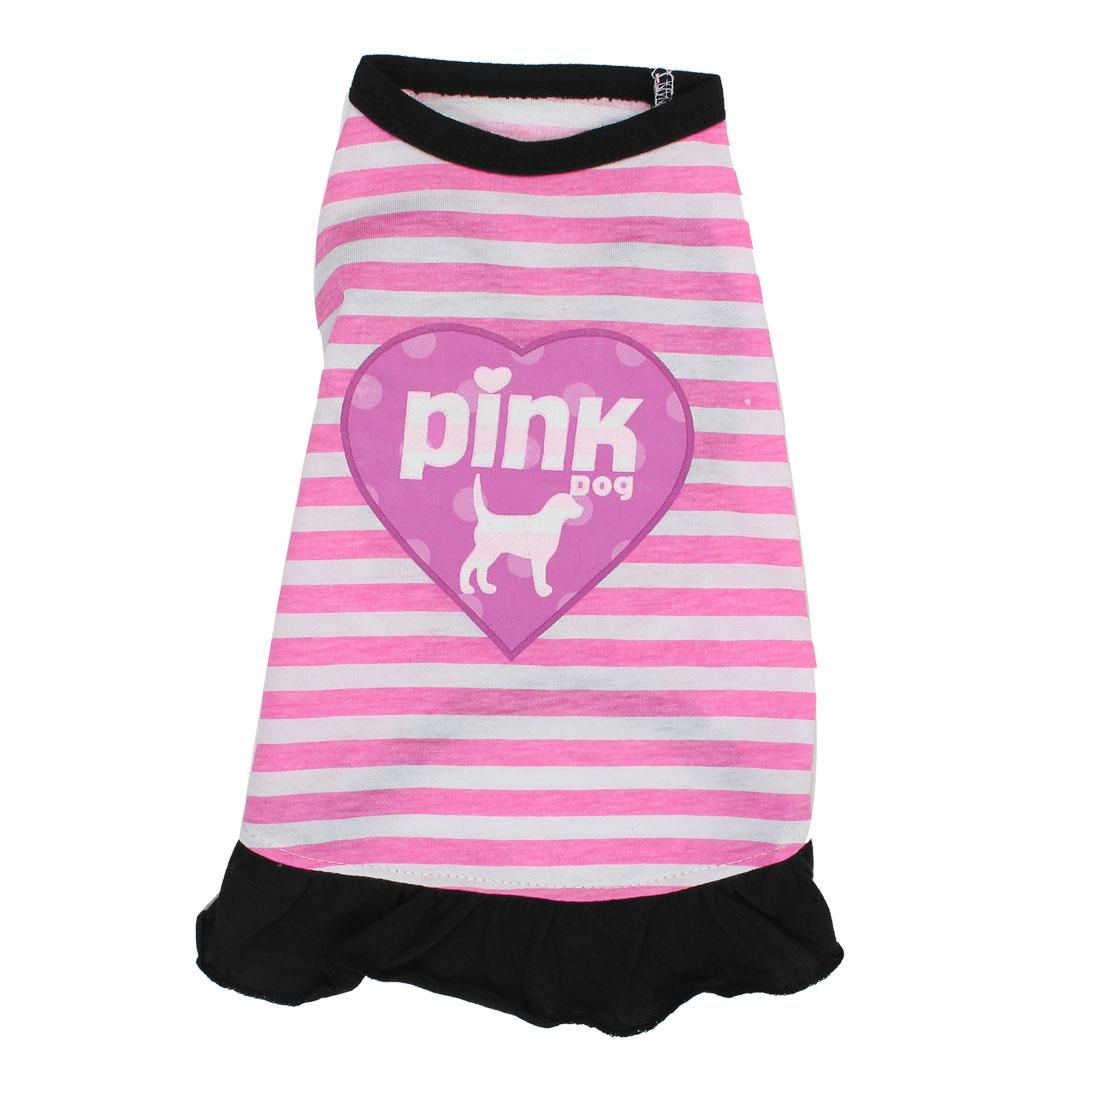 Striped Pet Puppy Summer Clothes Undershirt Skirt Apparel Dress Pink Size S